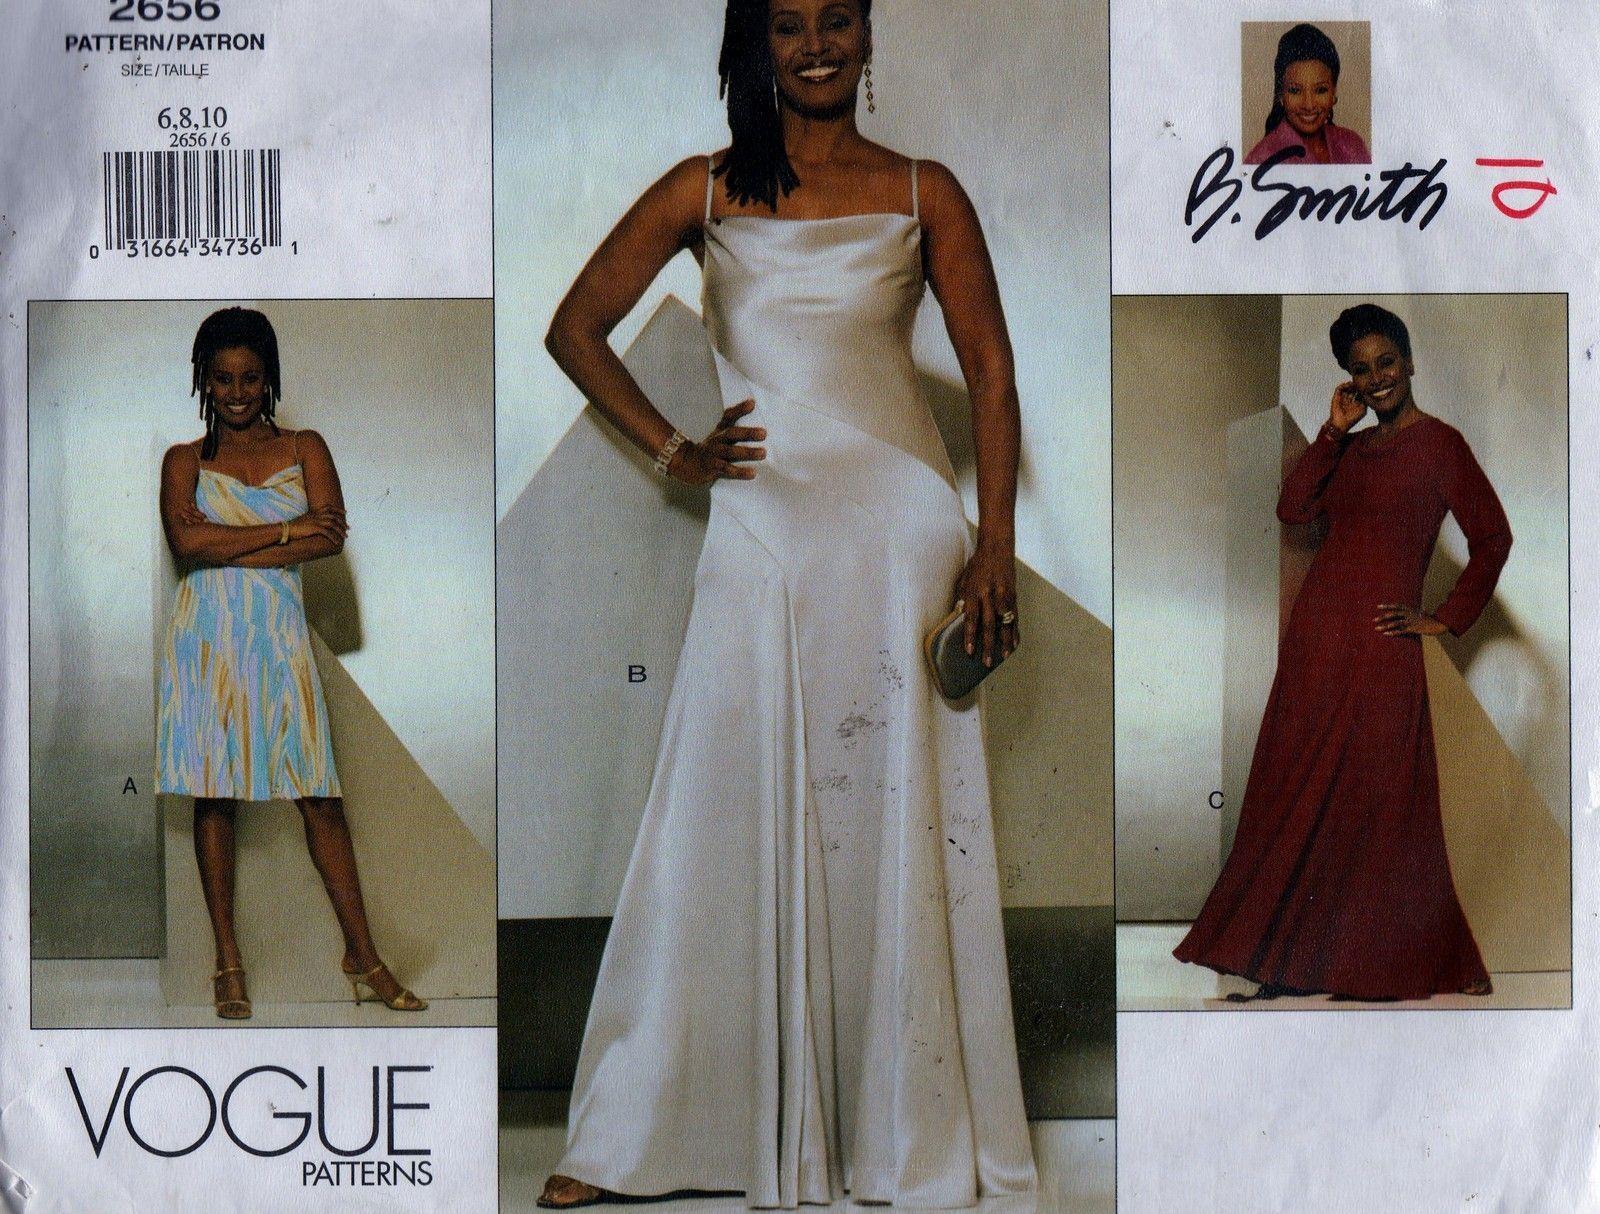 Vogue Sewing Pattern 2656 B. Smith Spaghetti Strap Evening Dress ...